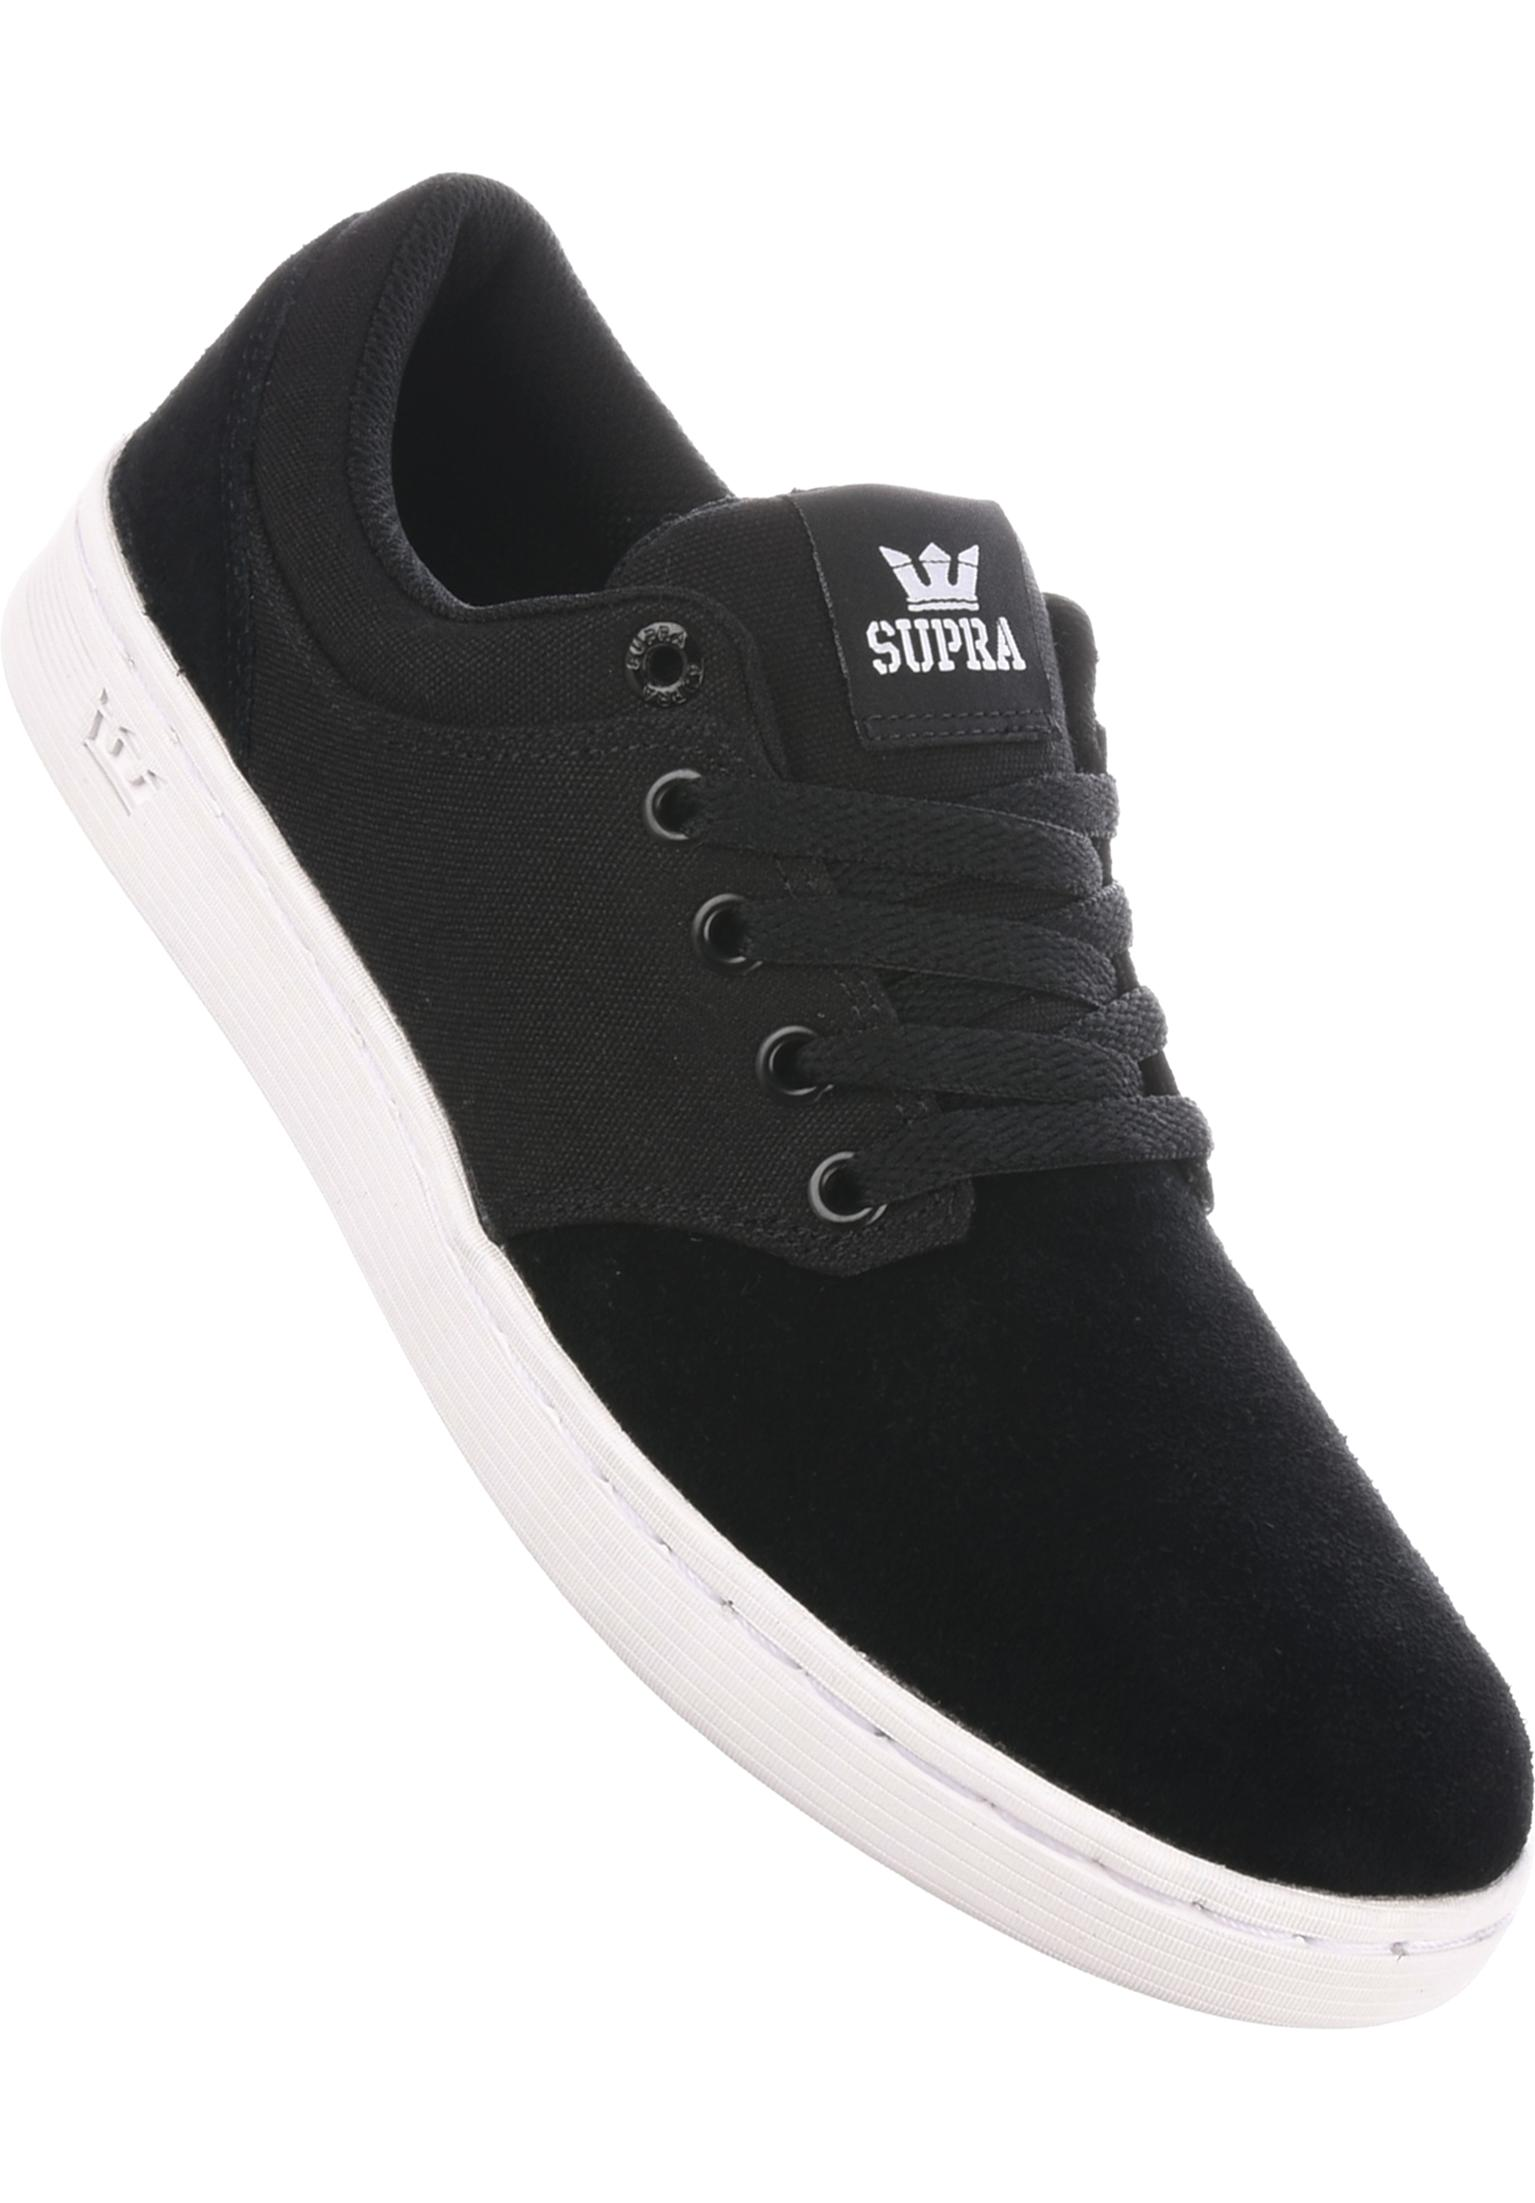 Chino Skateboard De Supra Chaussures Mix gbfyvY76